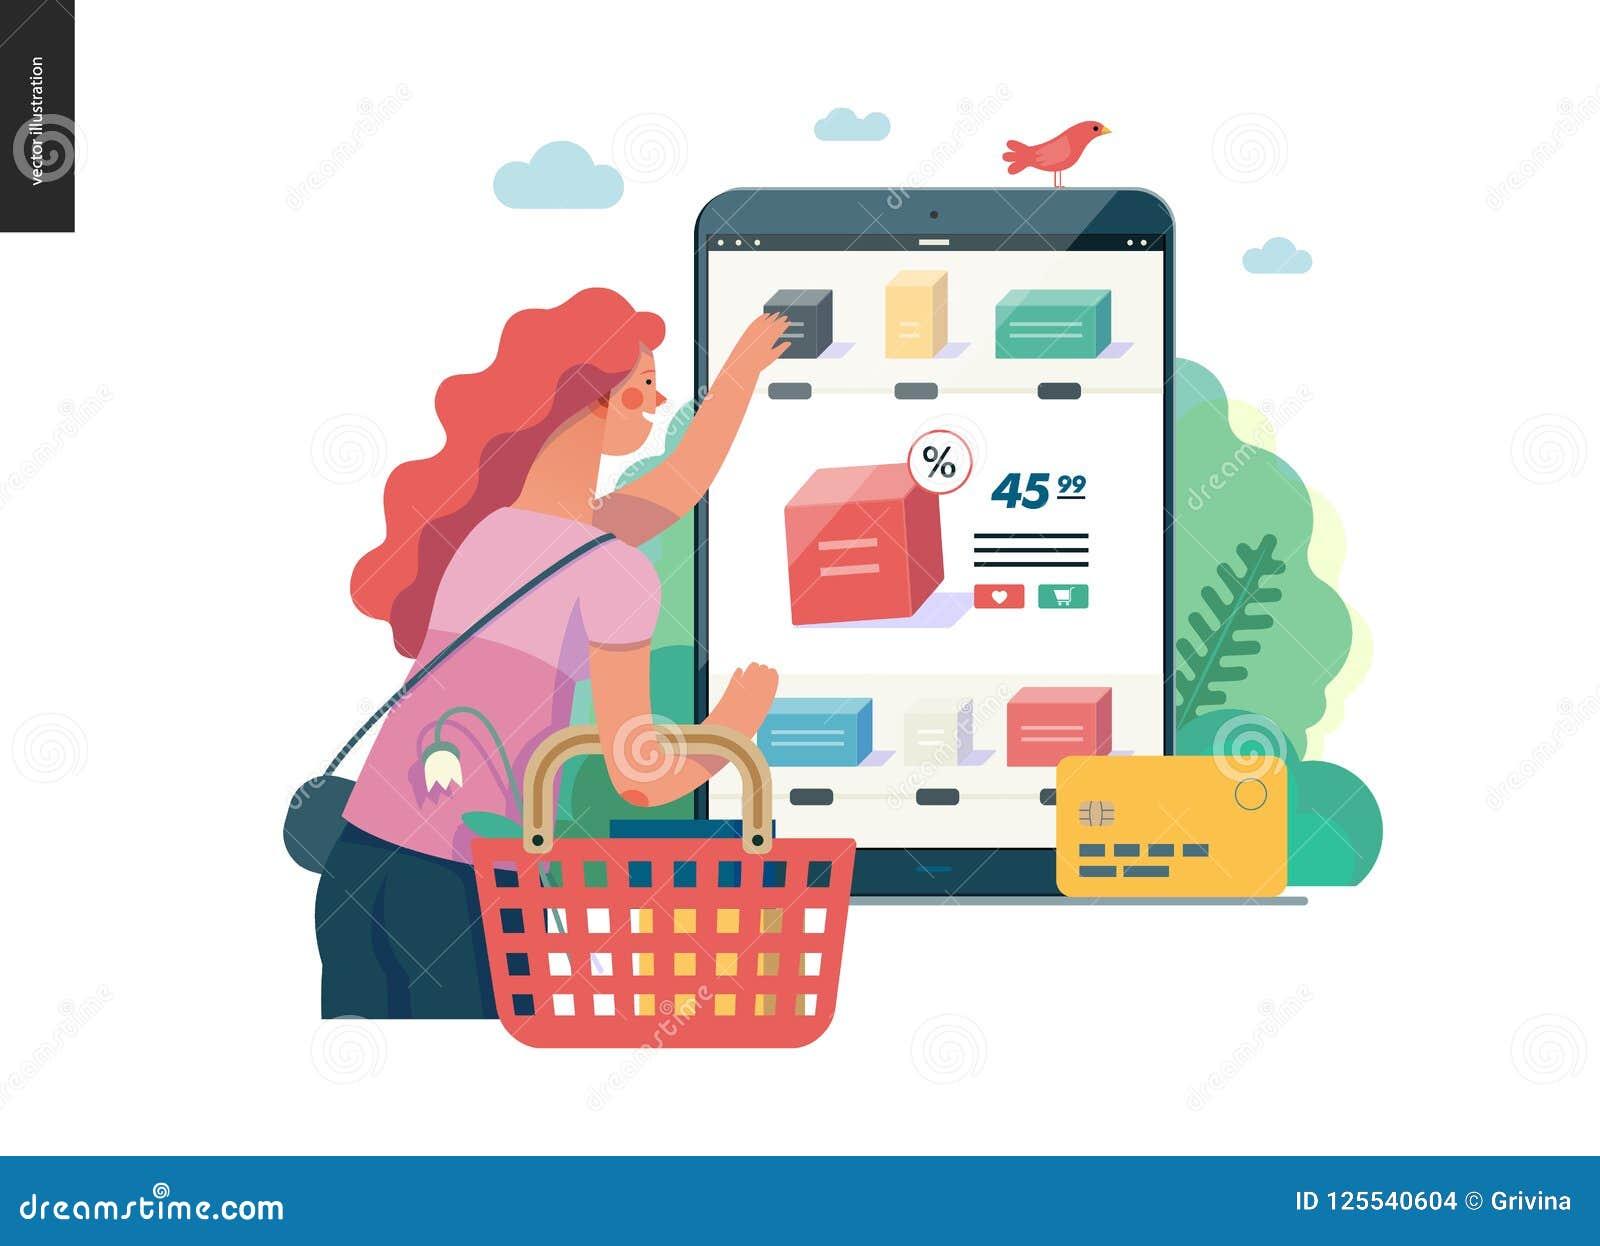 Business Series Buy Online Shop Web Template Stock Vector